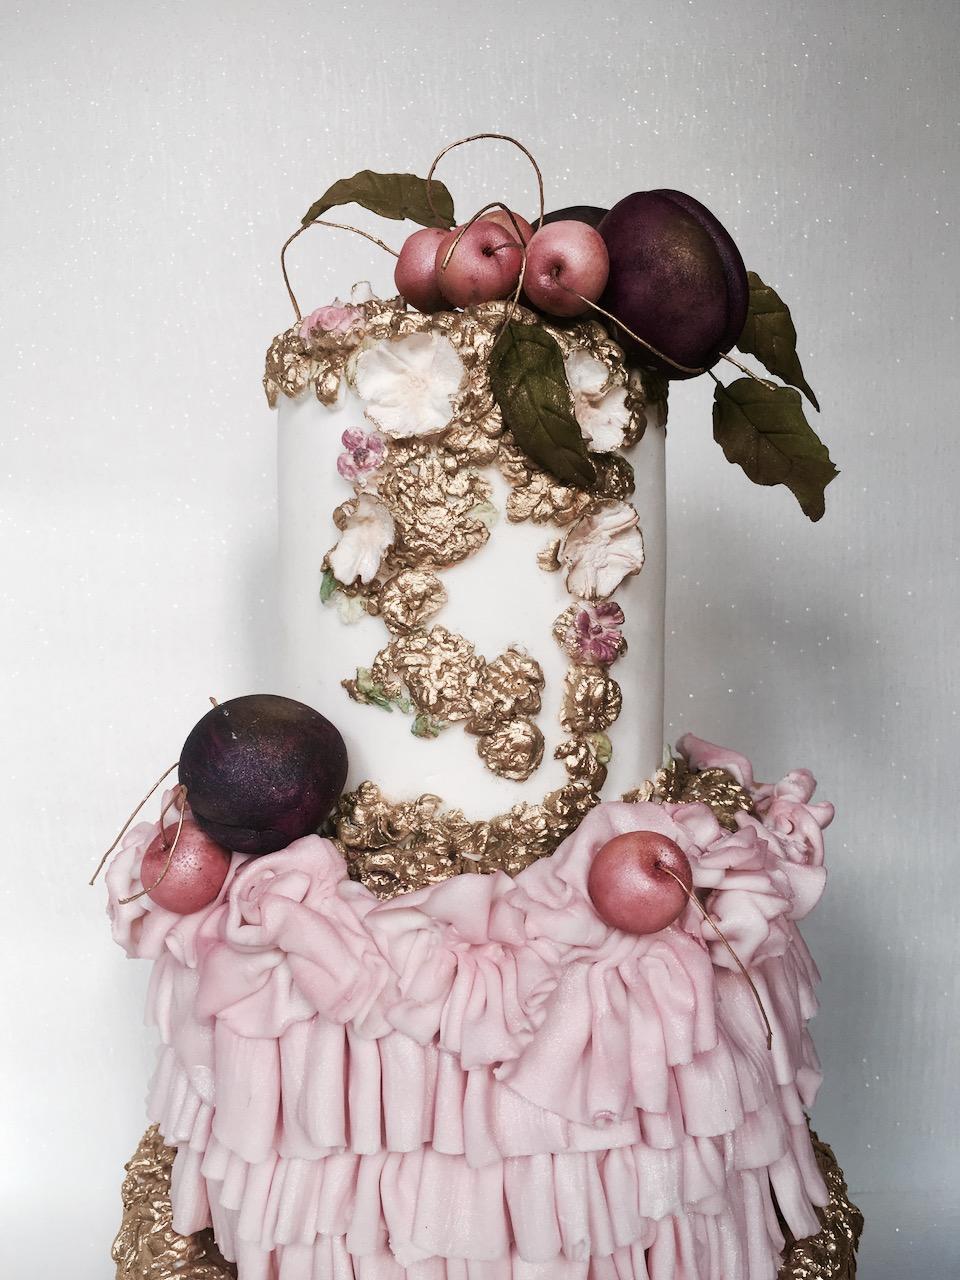 Pink ornate ruffle cake with sugar cherr